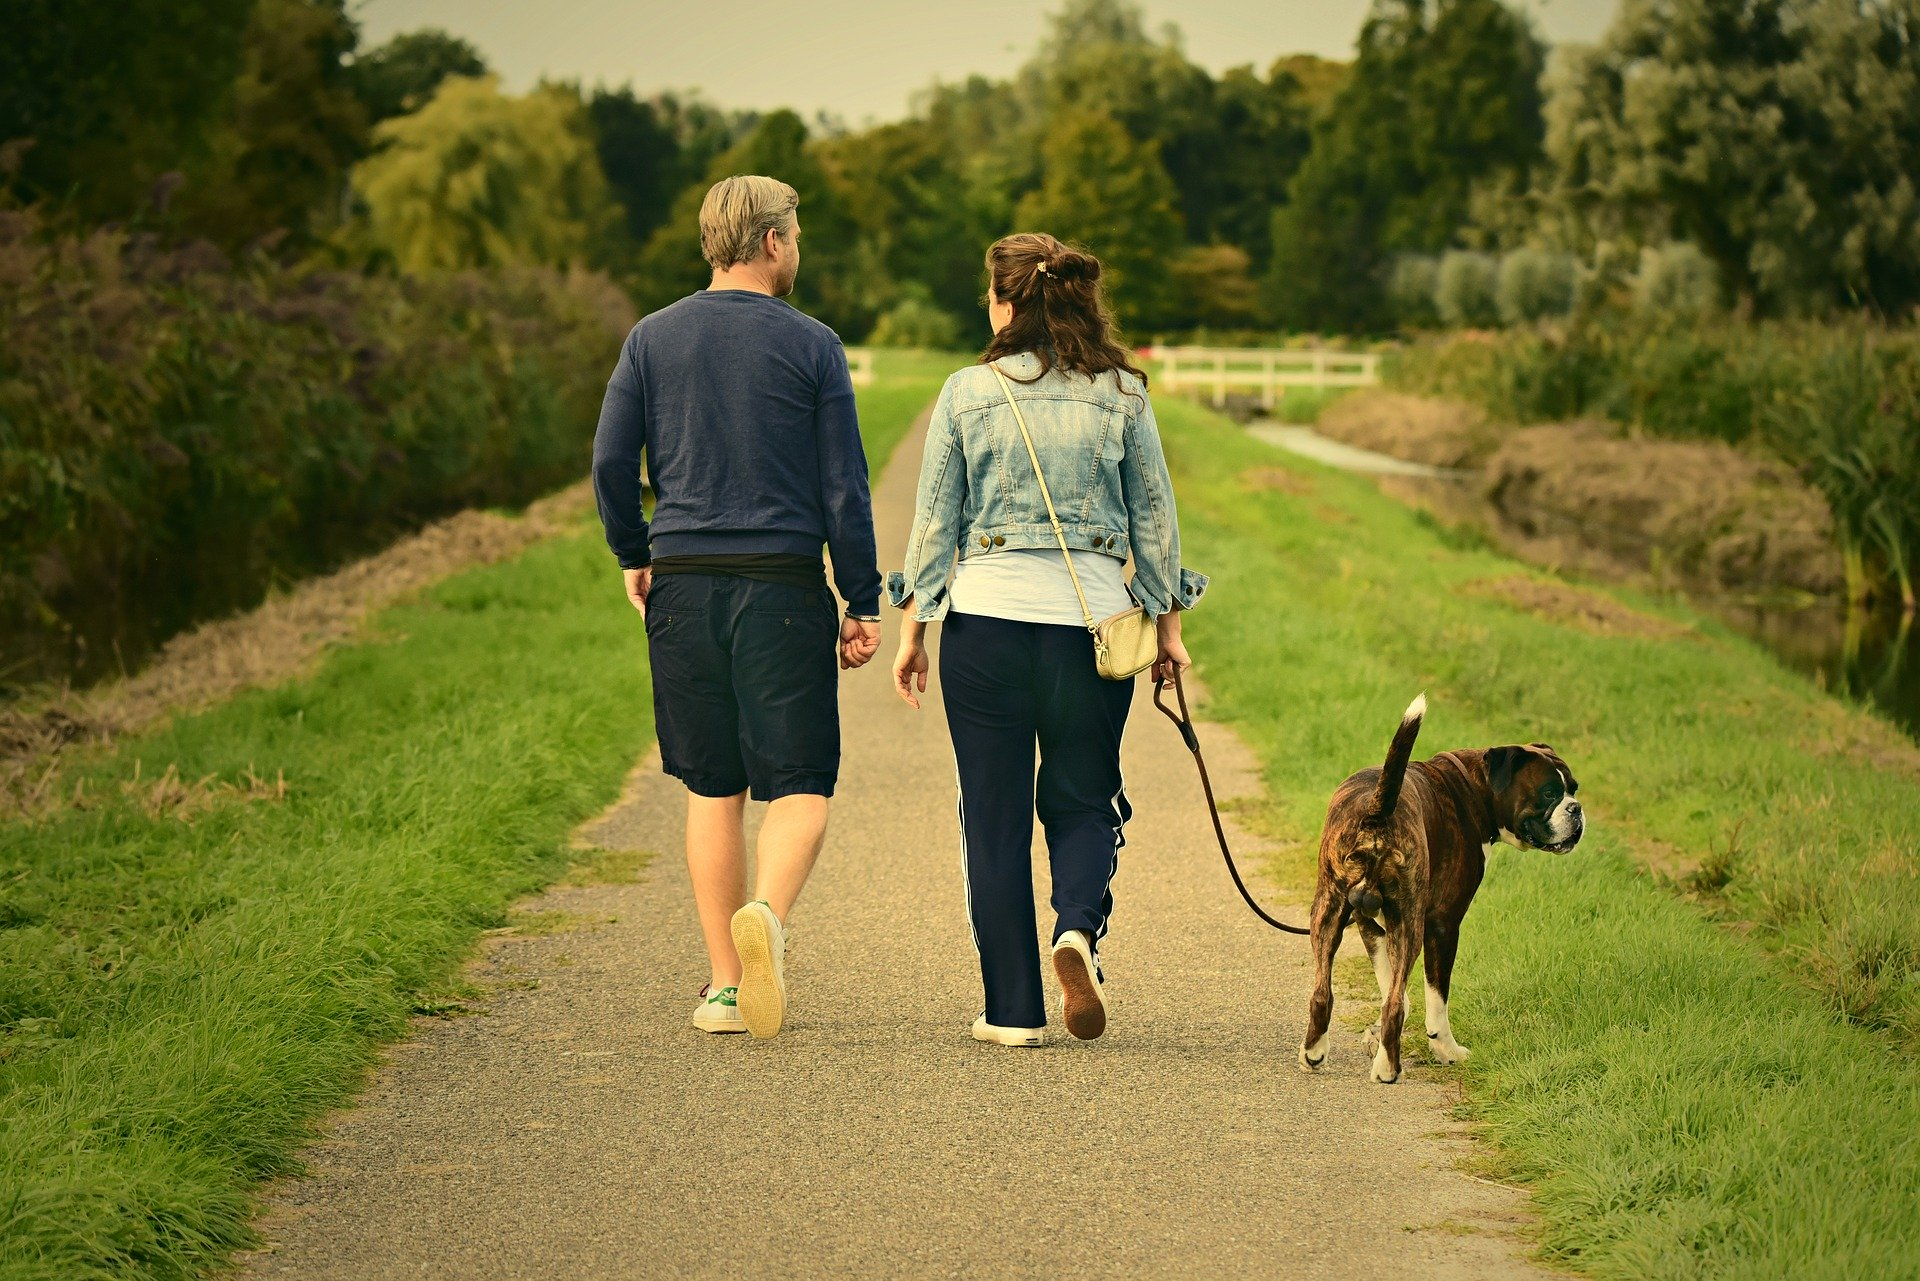 famille qui promène un chien